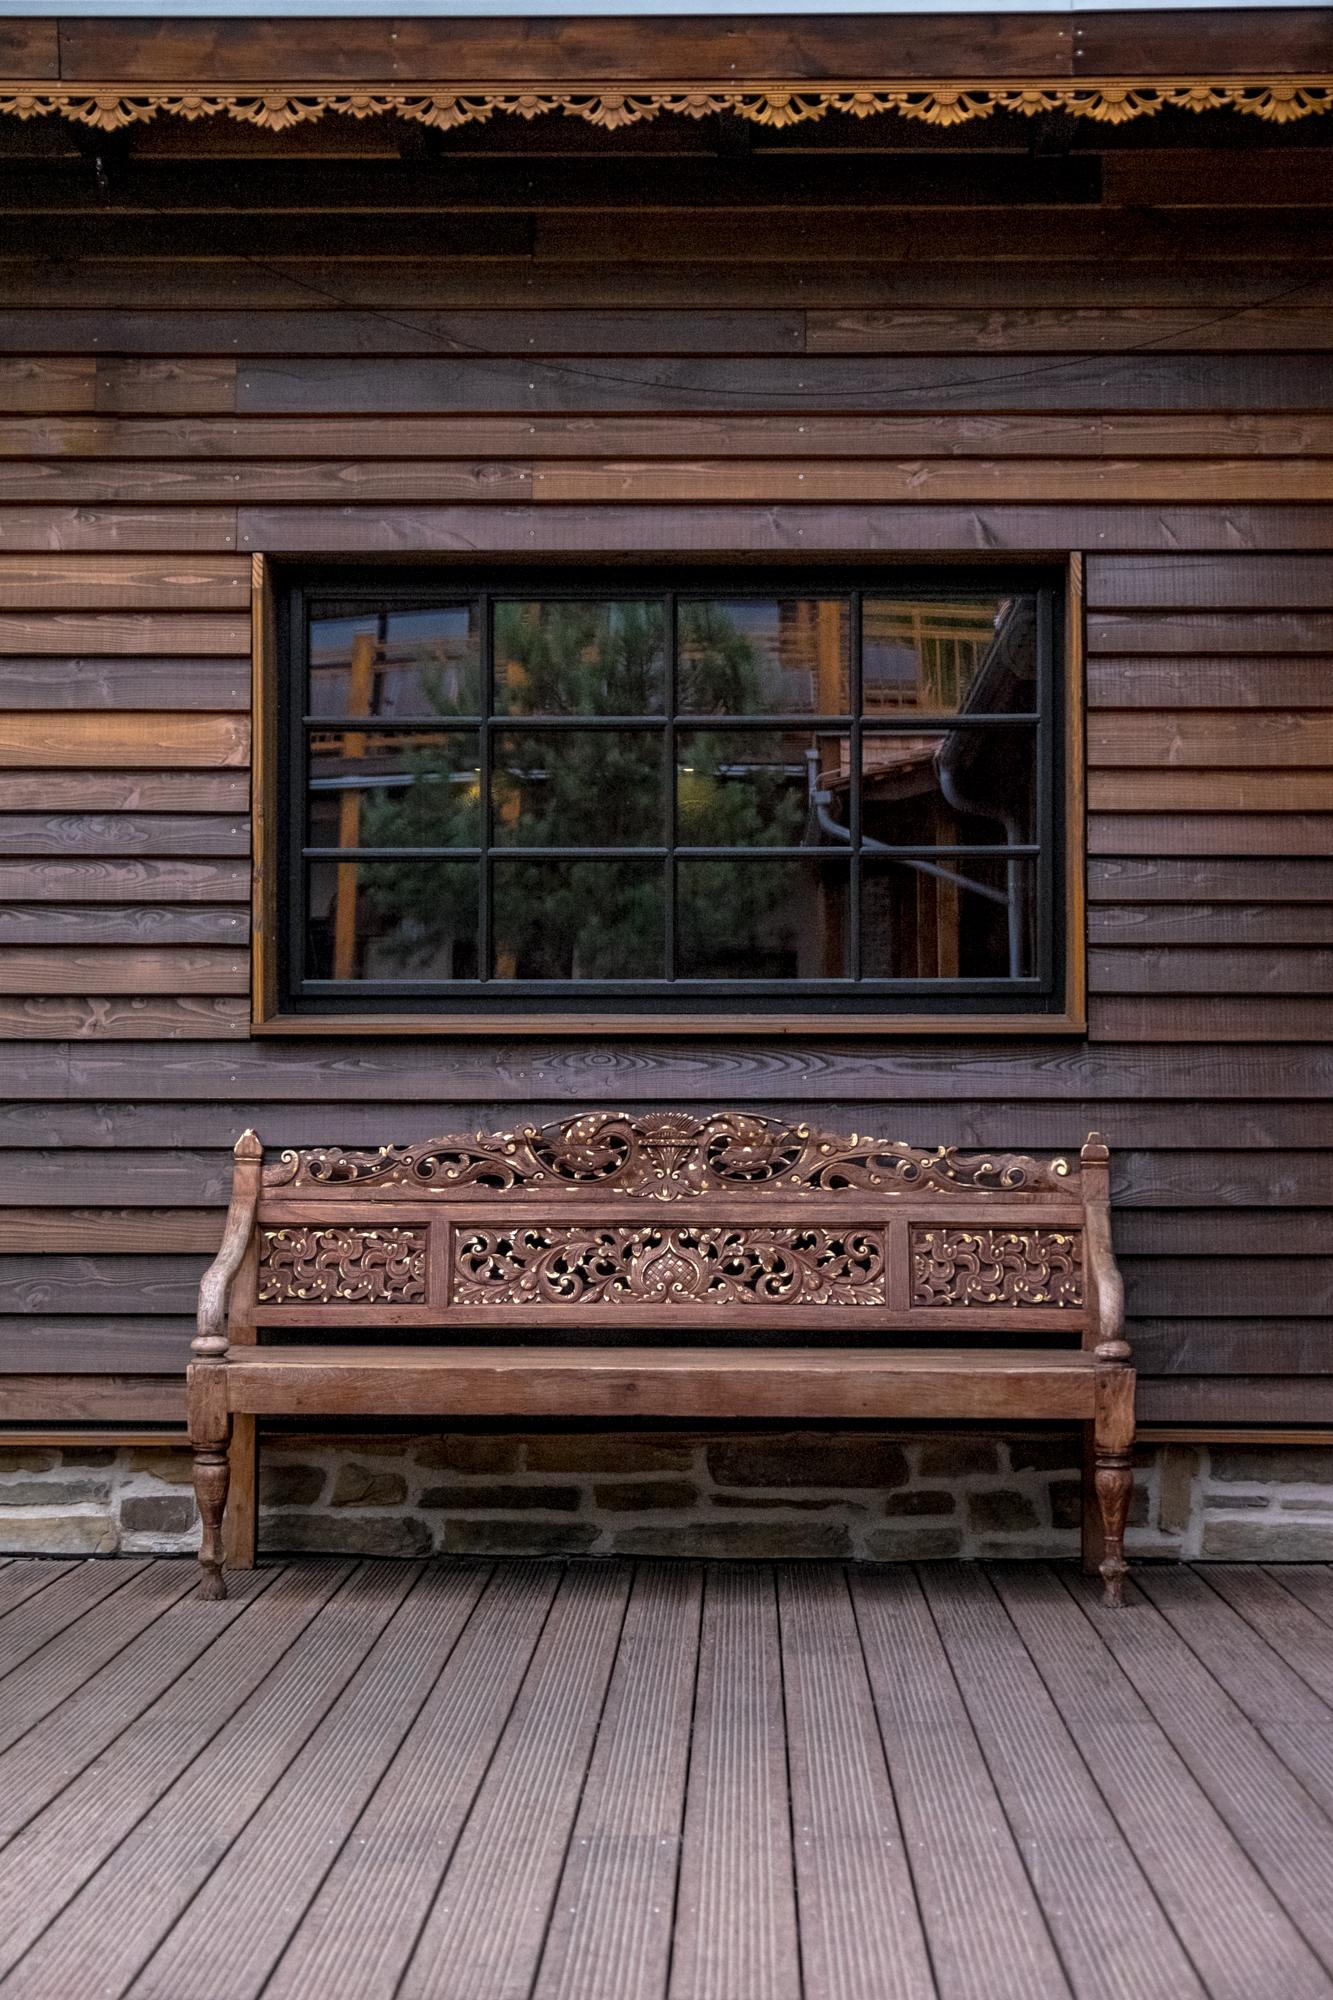 the dark wooden Bali inspired spa vabali